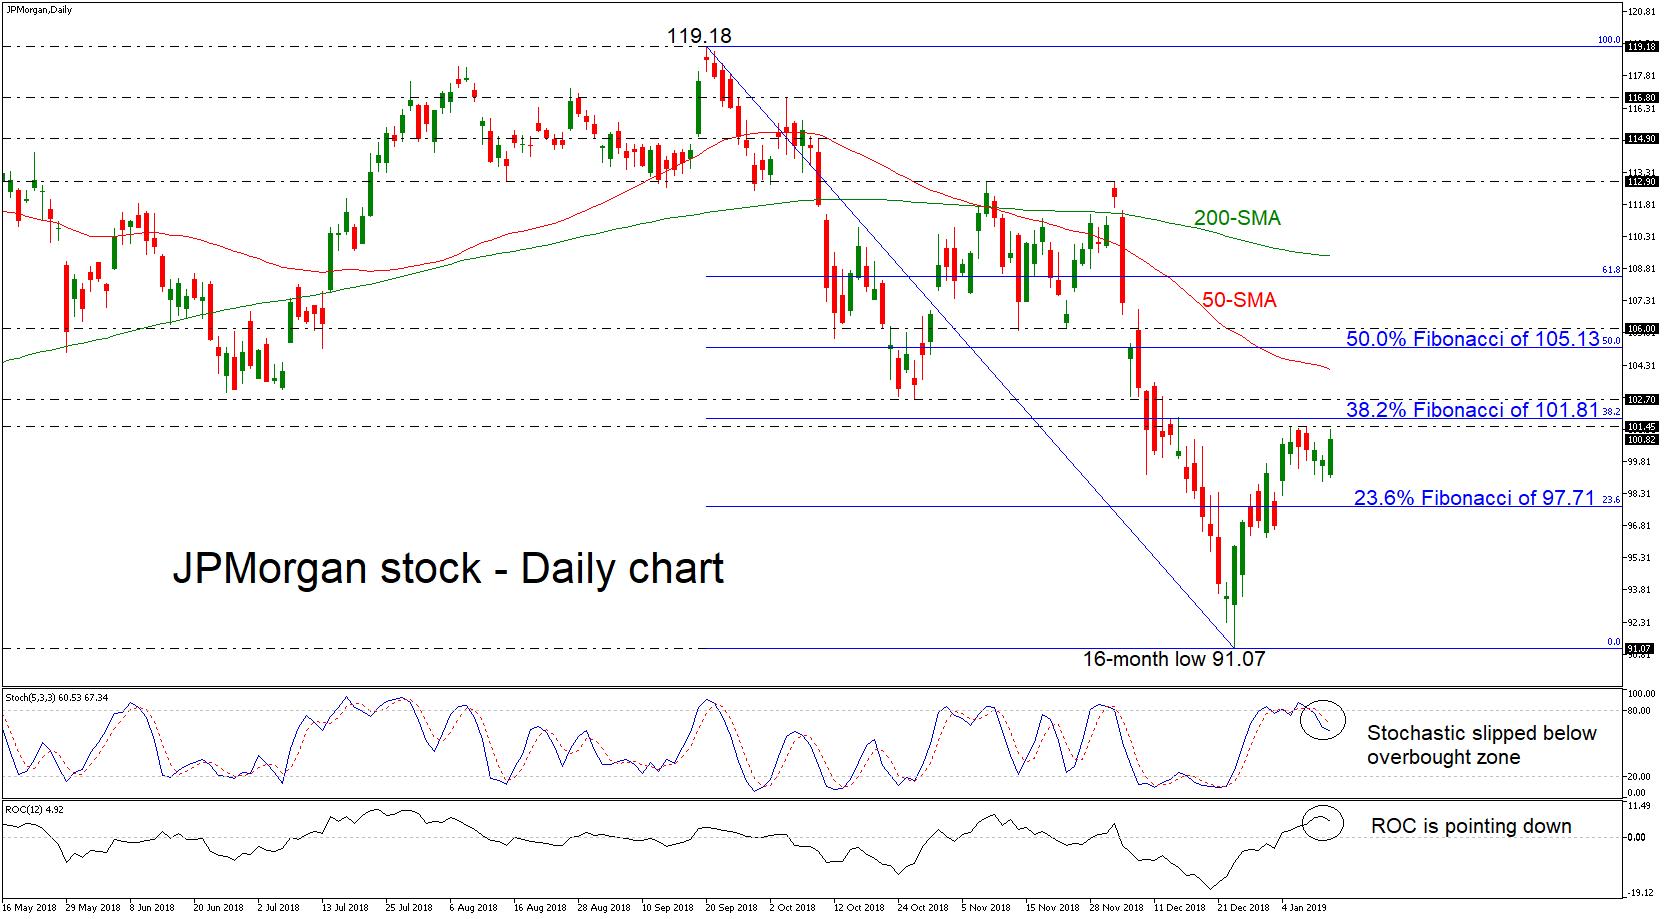 Technical Analysis – JPMorgan stock advances in near term